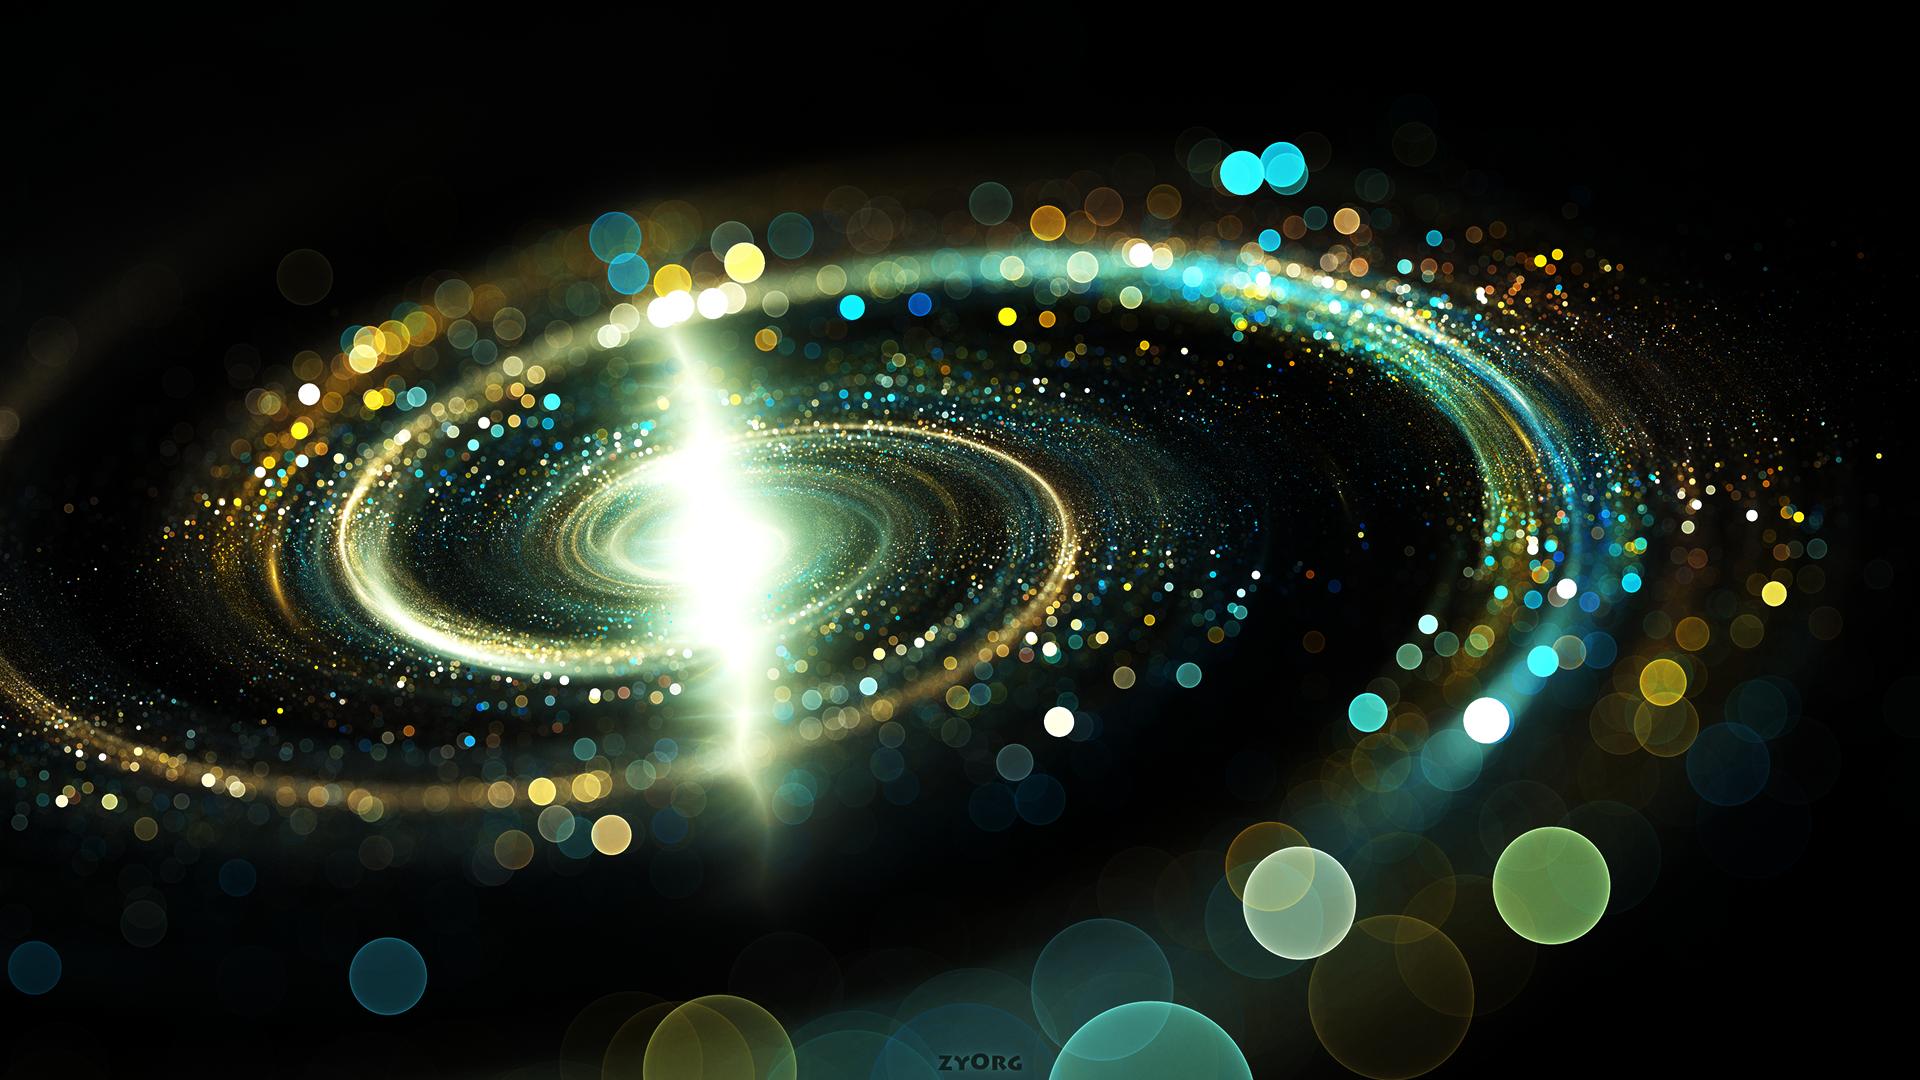 macro_galaxy_by_zy0rg-d67ifmz